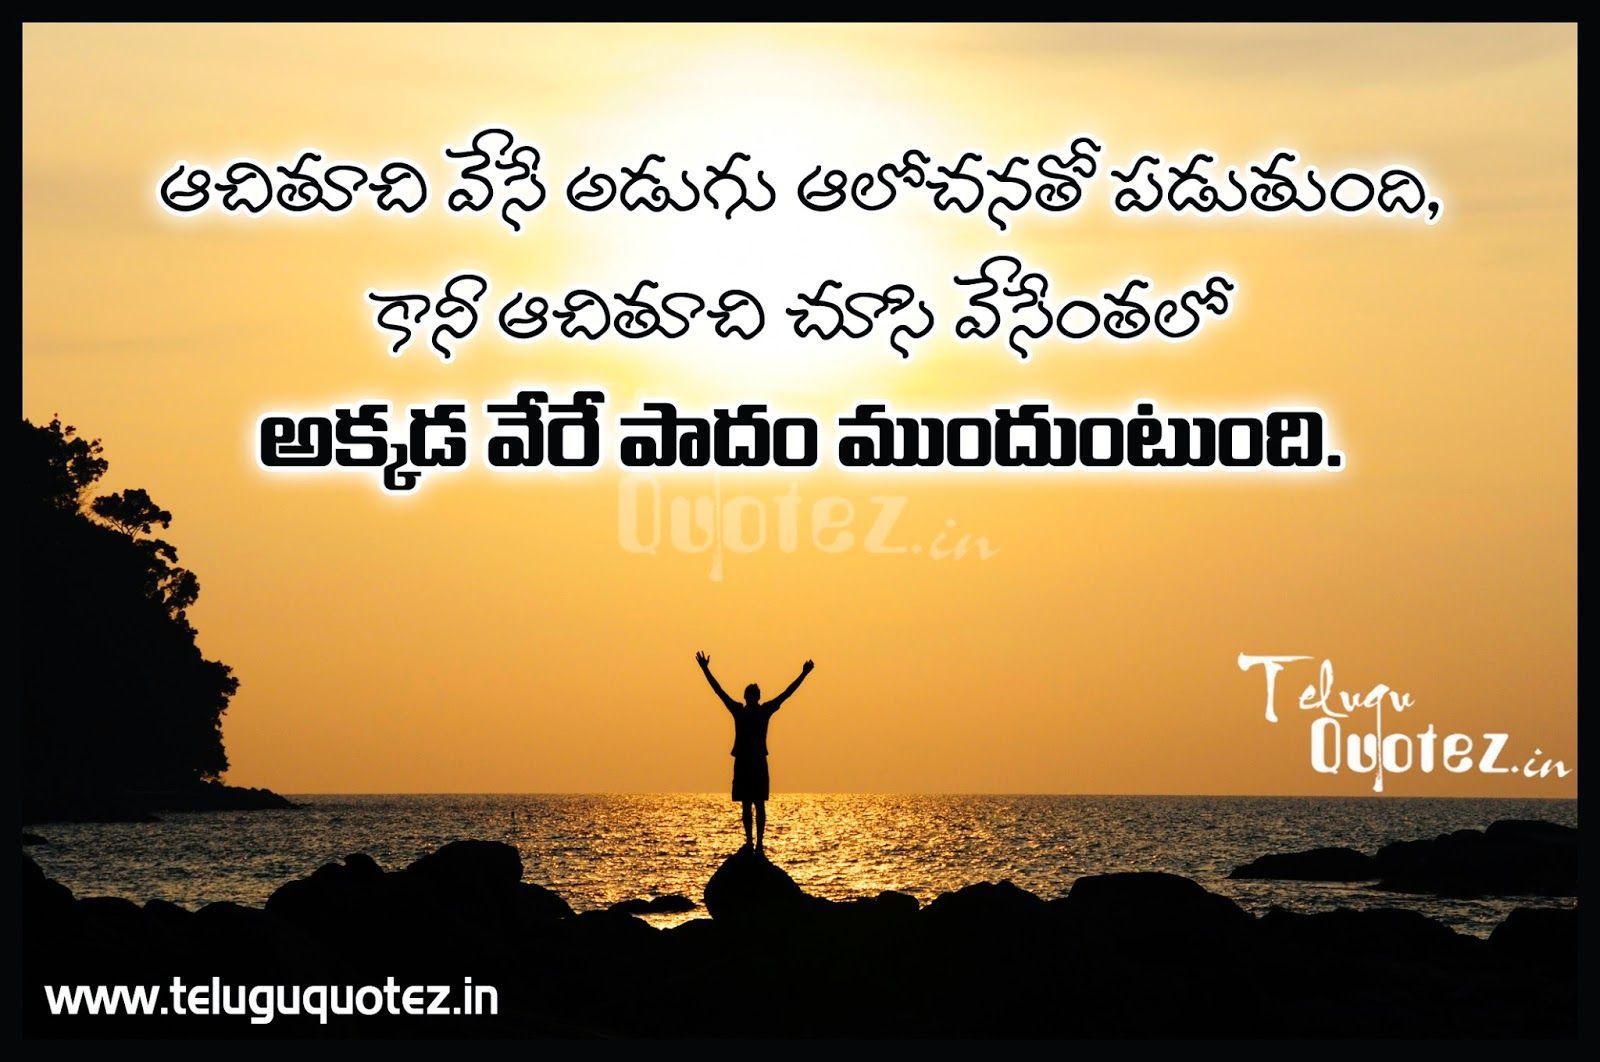 Life Journey Quotes Quotes Life Quotes Life Journey Quotes